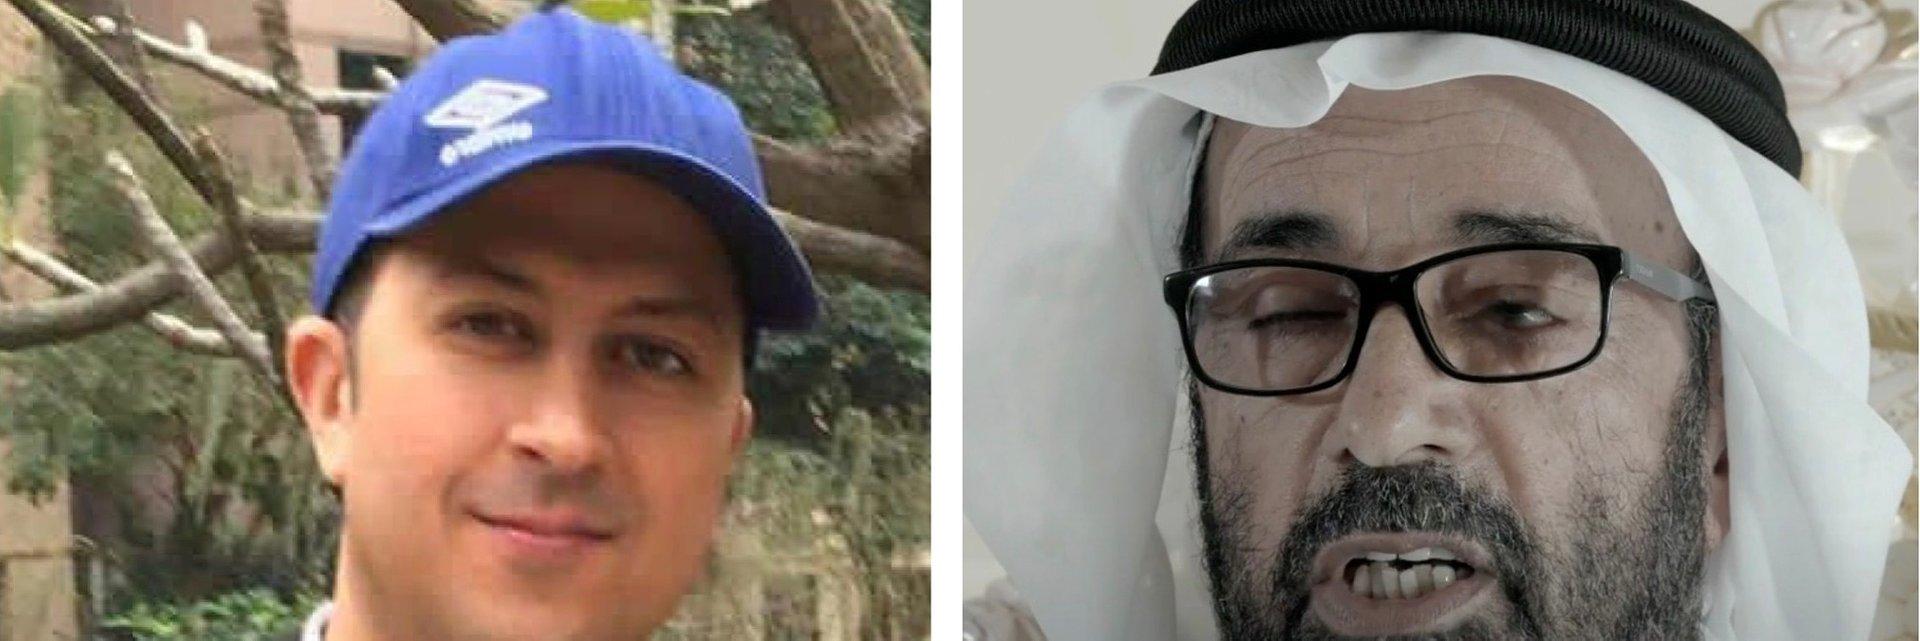 Man facing life sentence in UAE for 'upsetting Sheikh.'